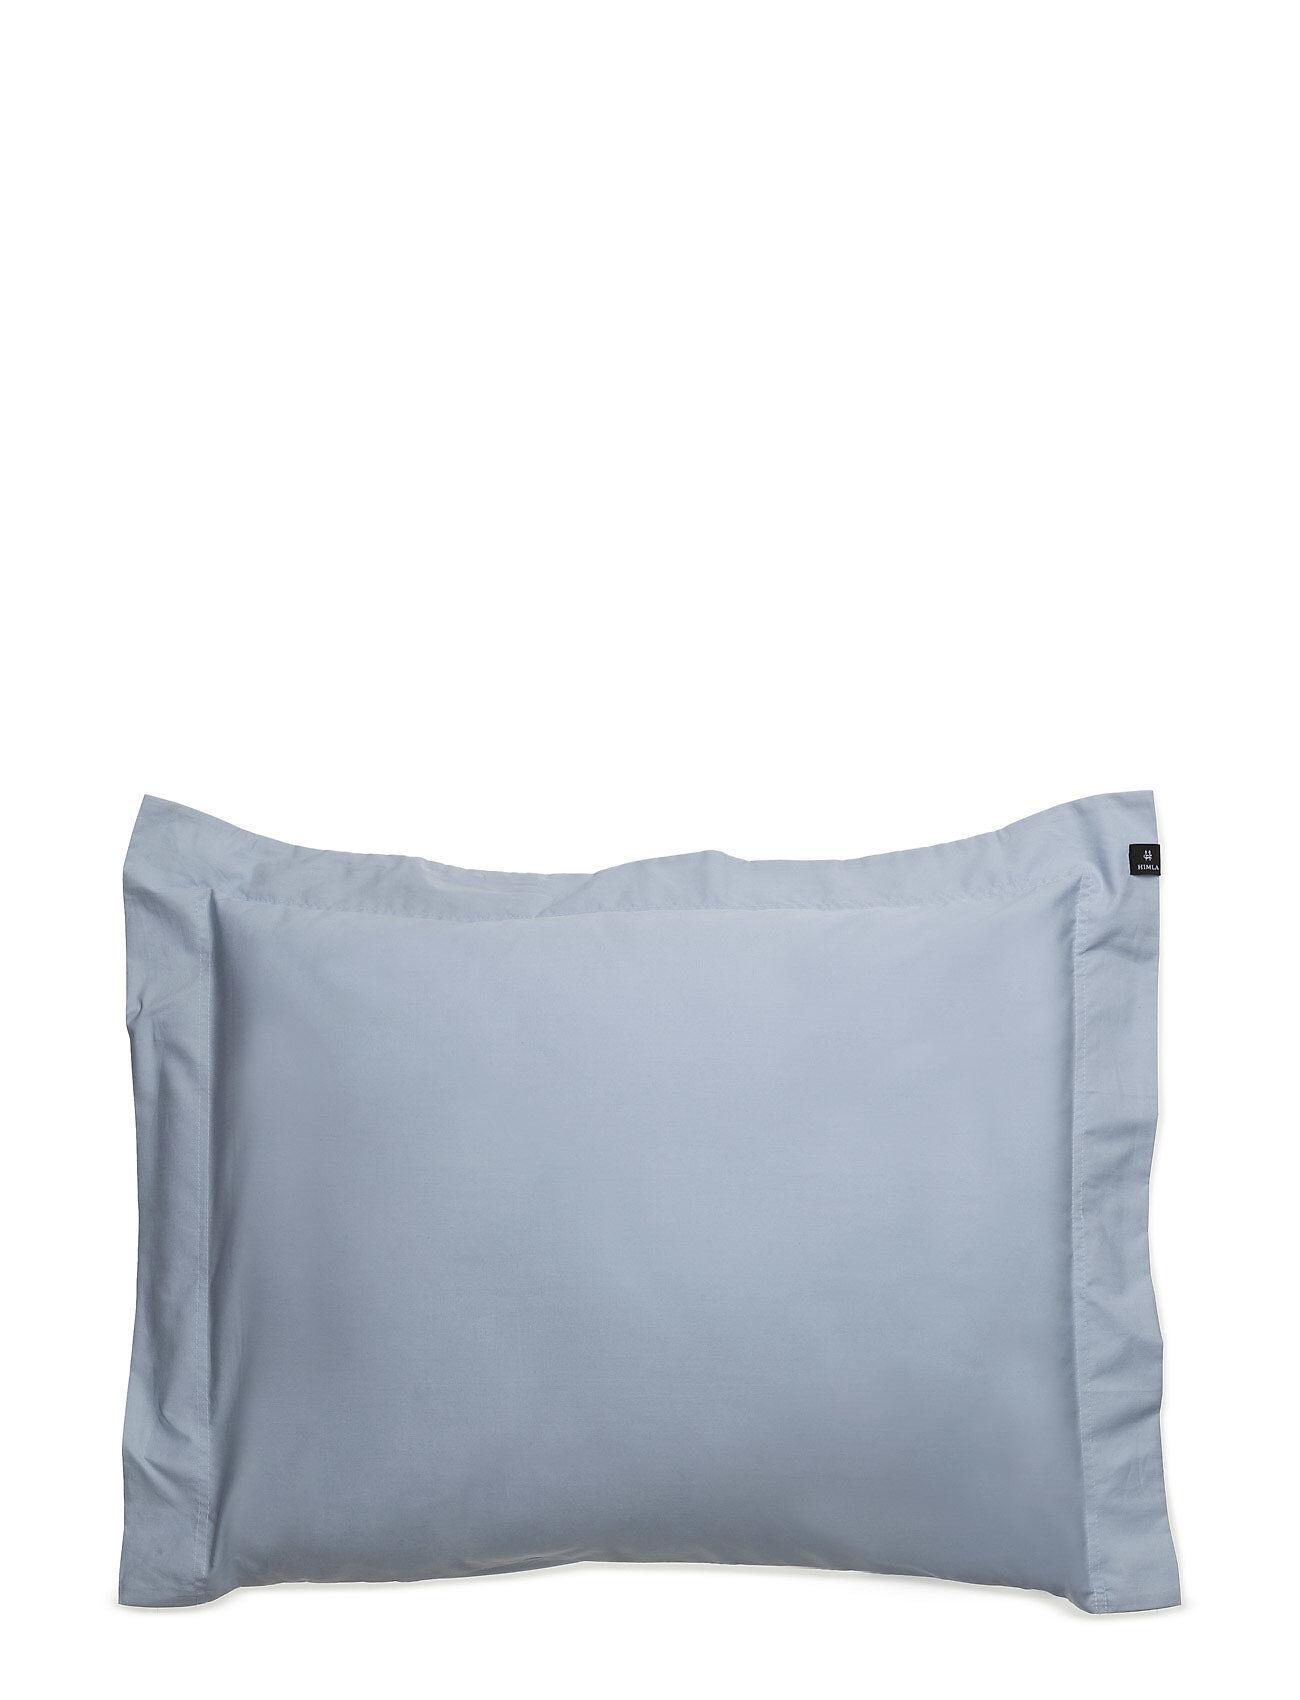 Himla Drottningholm Pillowcase With Wing Home Bedroom Bedding Pillowcases Sininen Himla